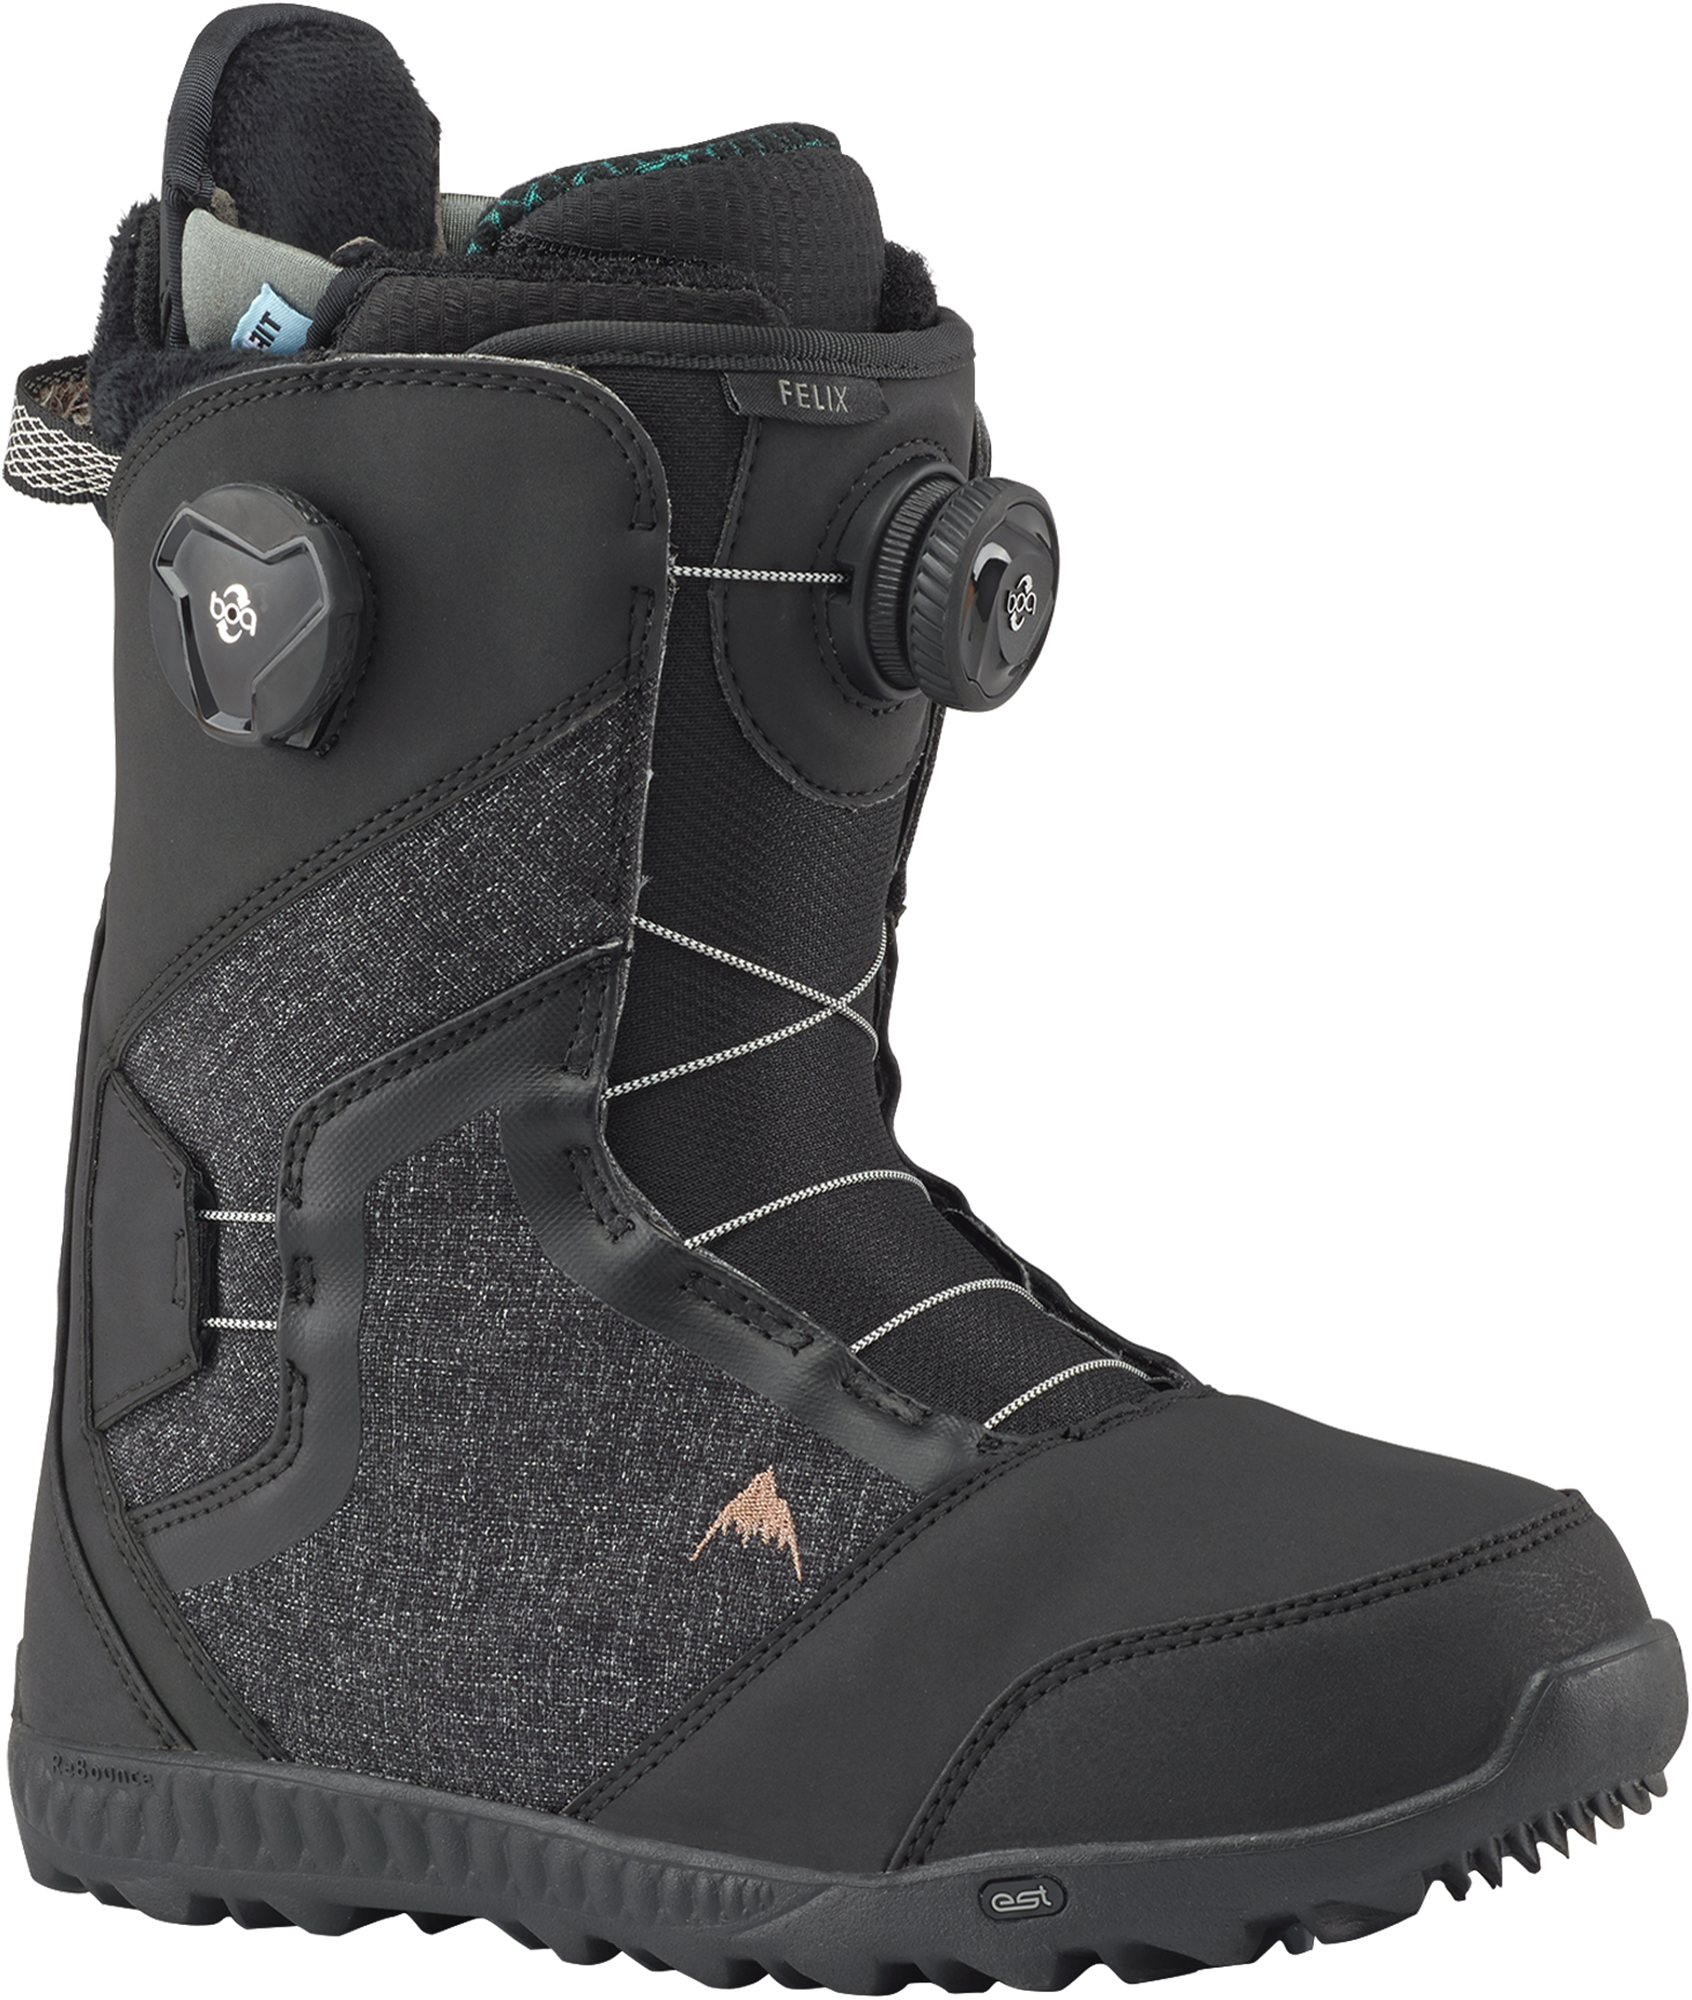 Burton Сноубордические ботинки женские  Felix Boa, размер 38,5